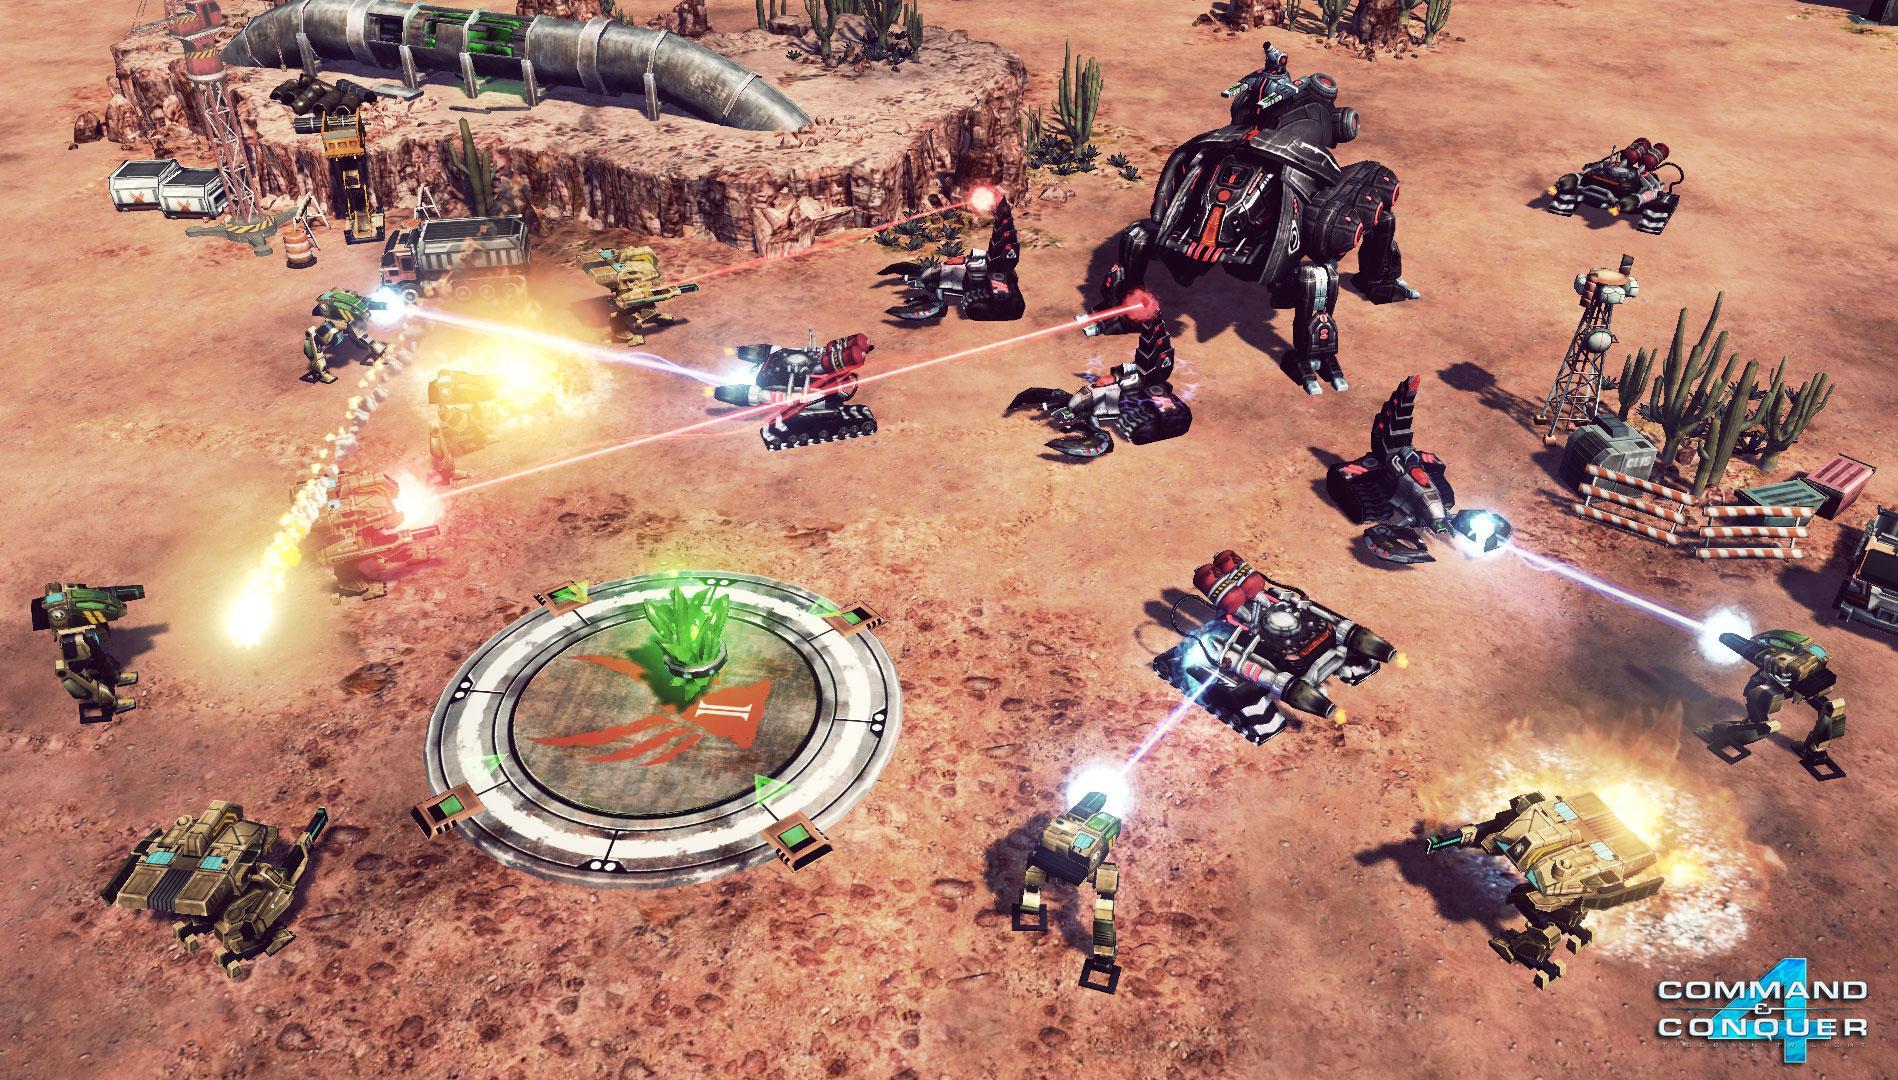 Command & Conquer 4: Tiberian Twilight on Steam